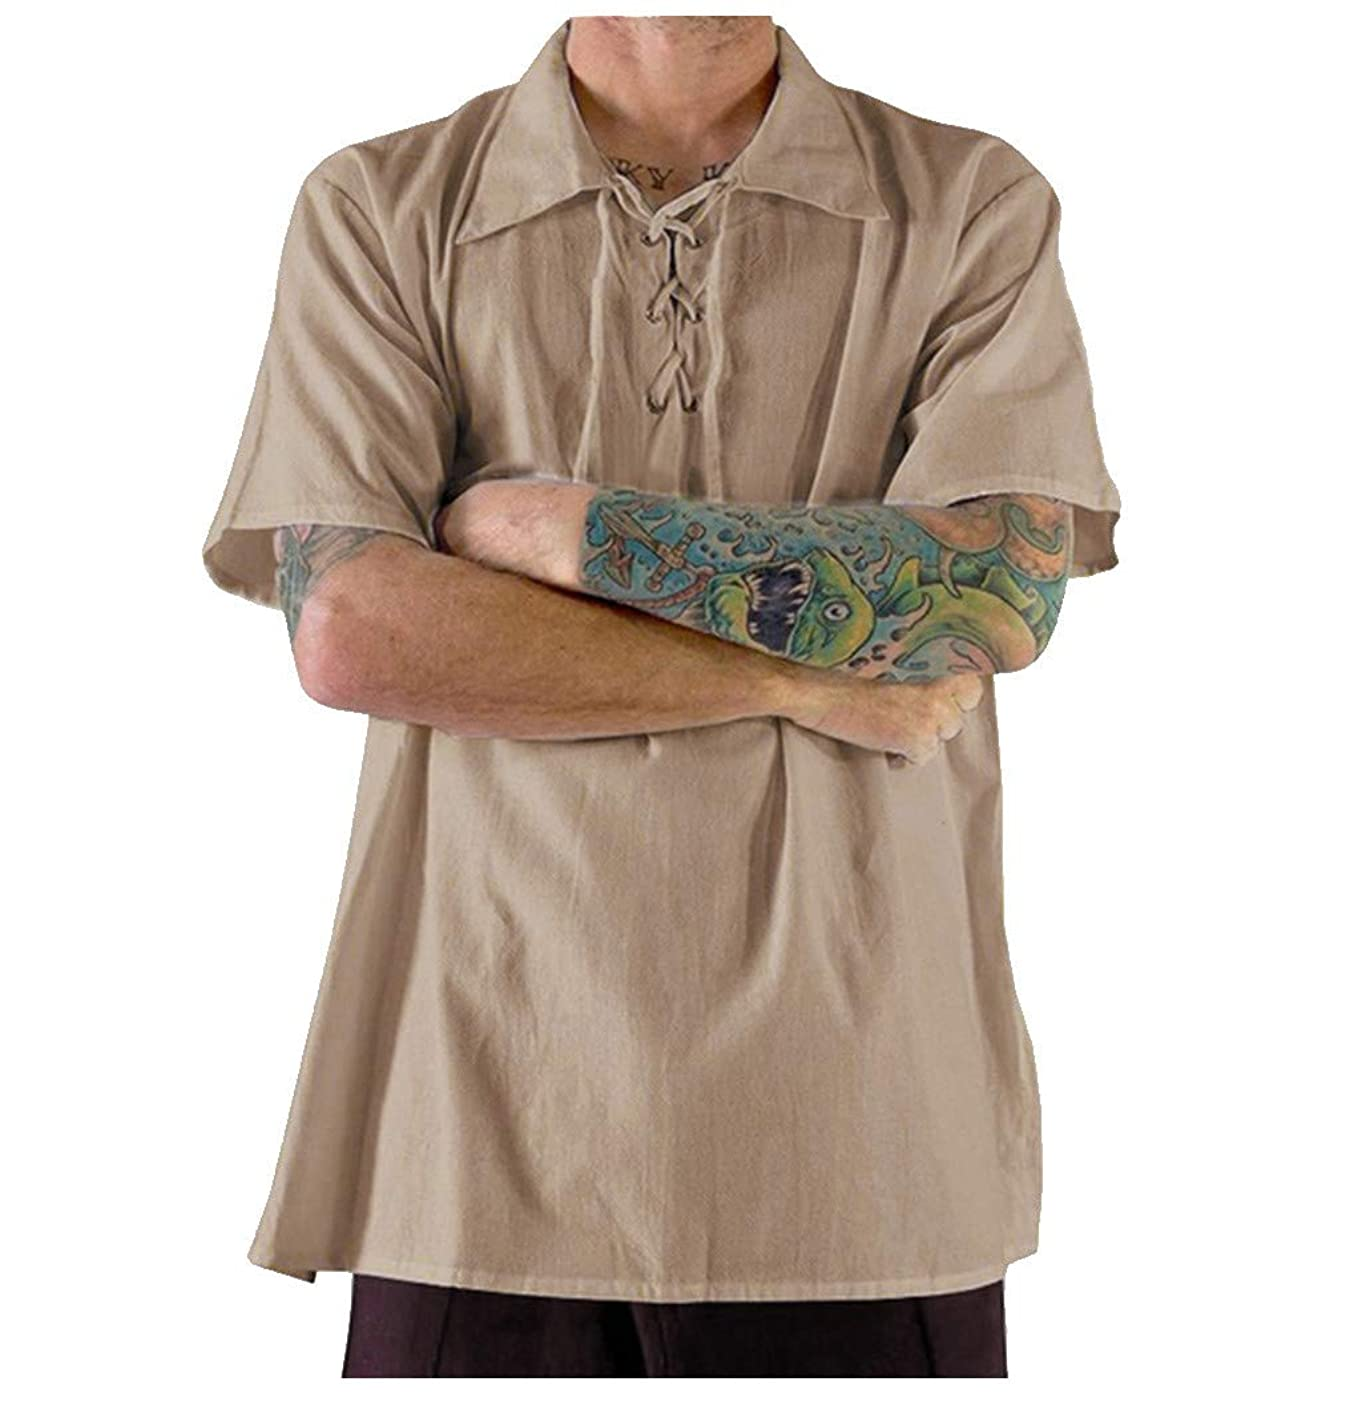 Nuewofally Men Linen Henley Shirts Casual Standard Fit Short Sleeve Basic Summer Beach Tie Shirts Yoga Top Blouse Tee (Khaki,3XL)